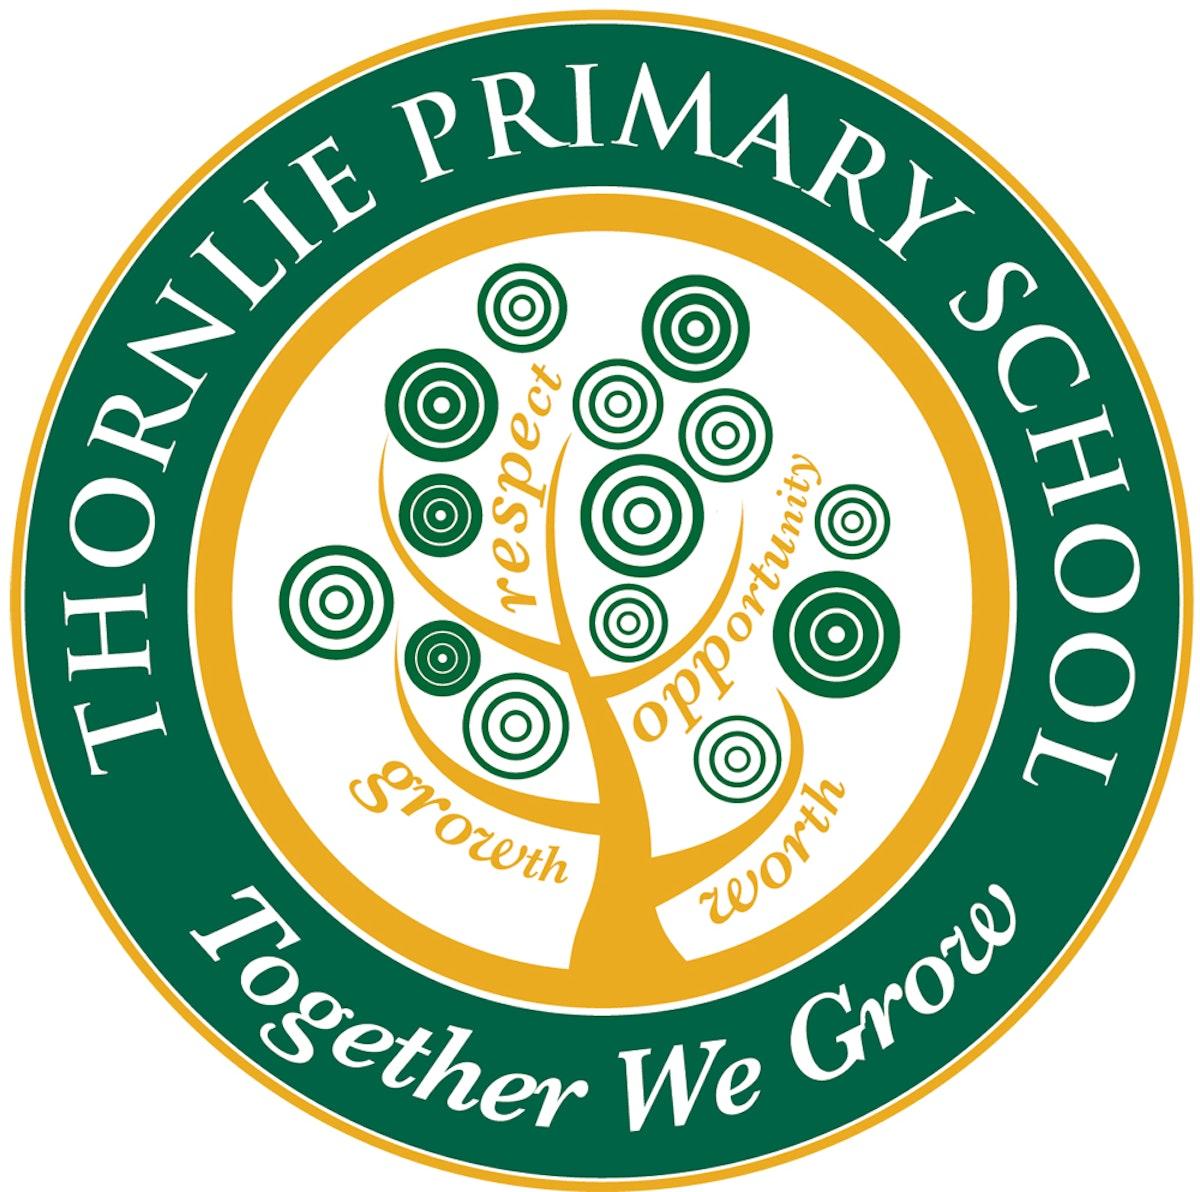 thornlie ps_logo_rgb